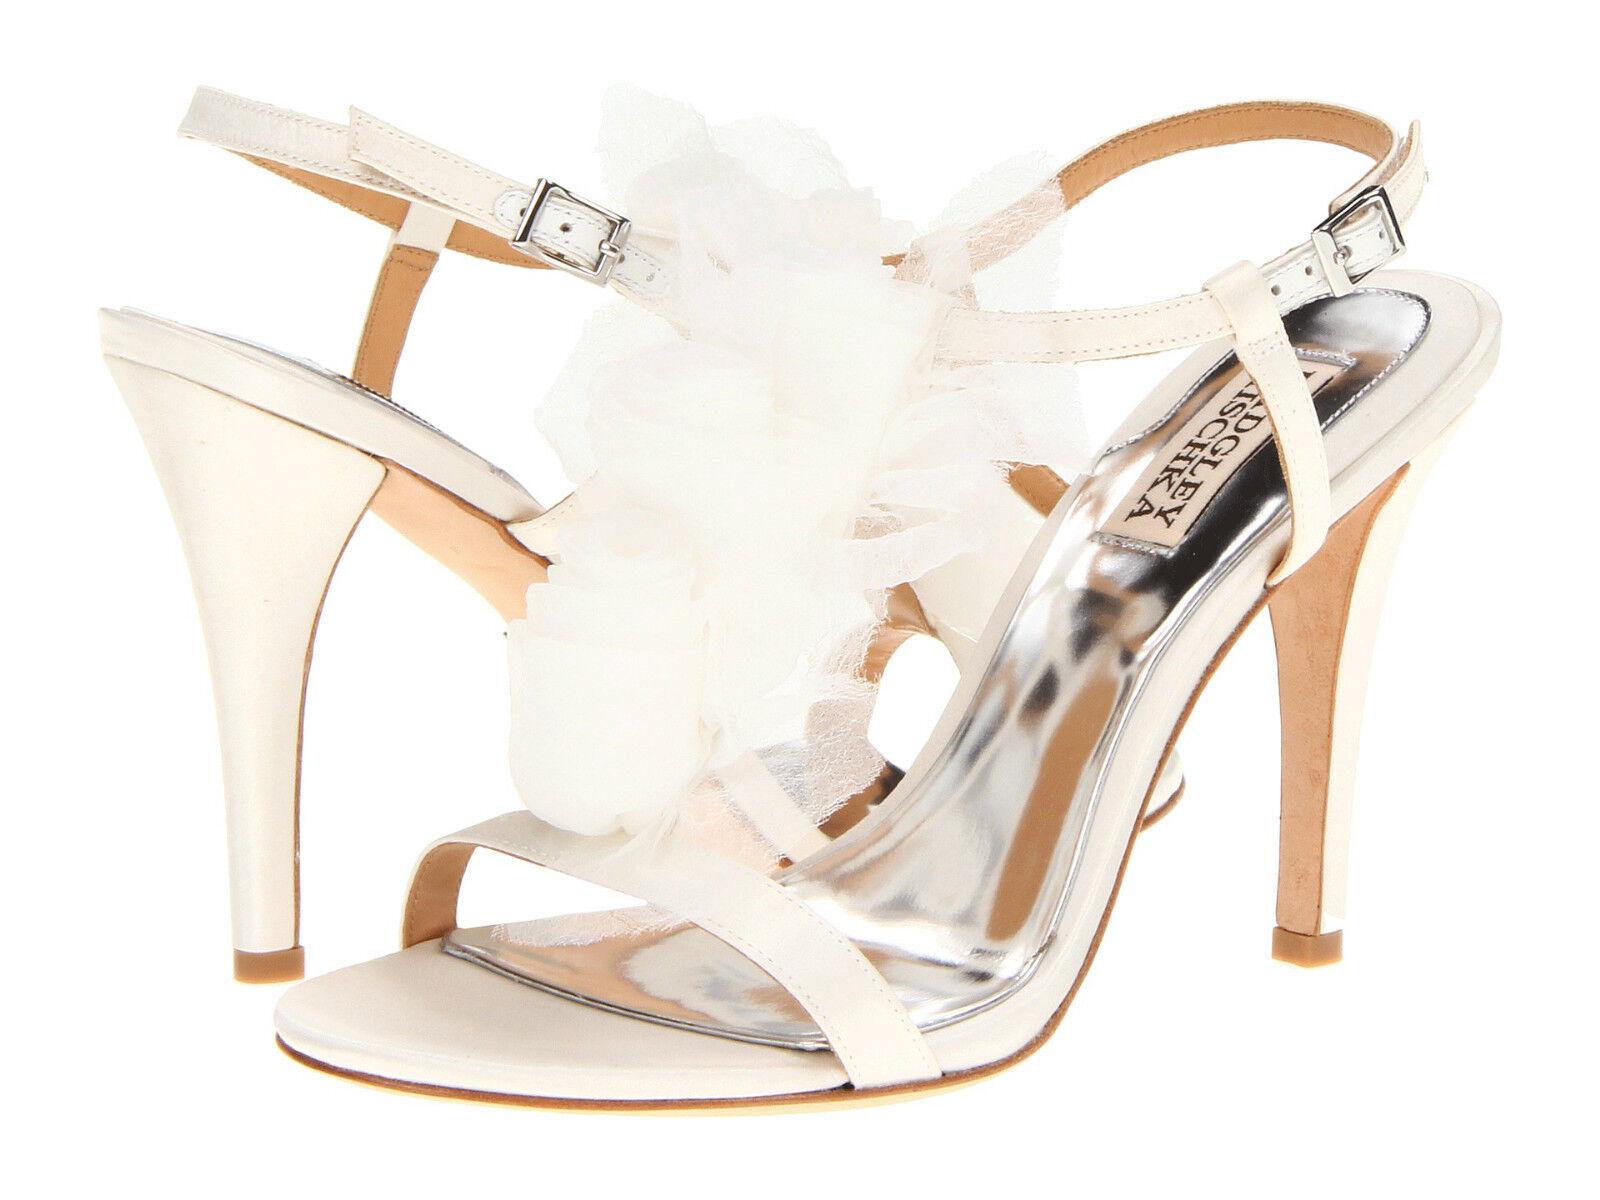 Badgley Mischka Size 10 White Satin Heel Sandal shoes Msrp